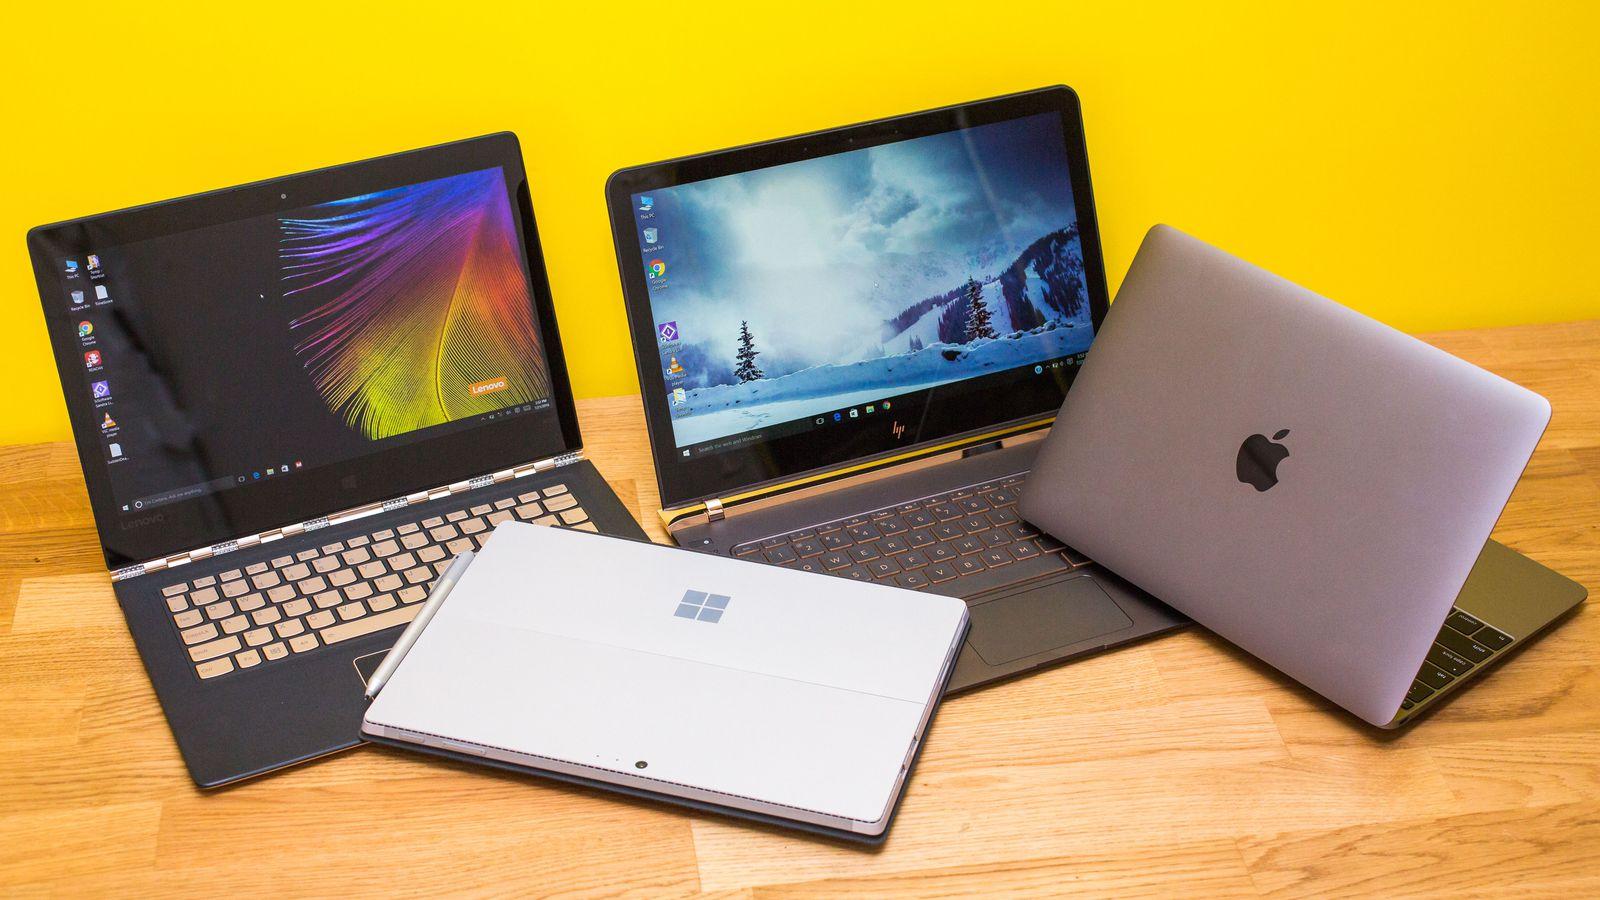 Lieu-co-the-mua-laptop-cu-sai-gon-uy tín-tu-cac-ca-nhan-khong1